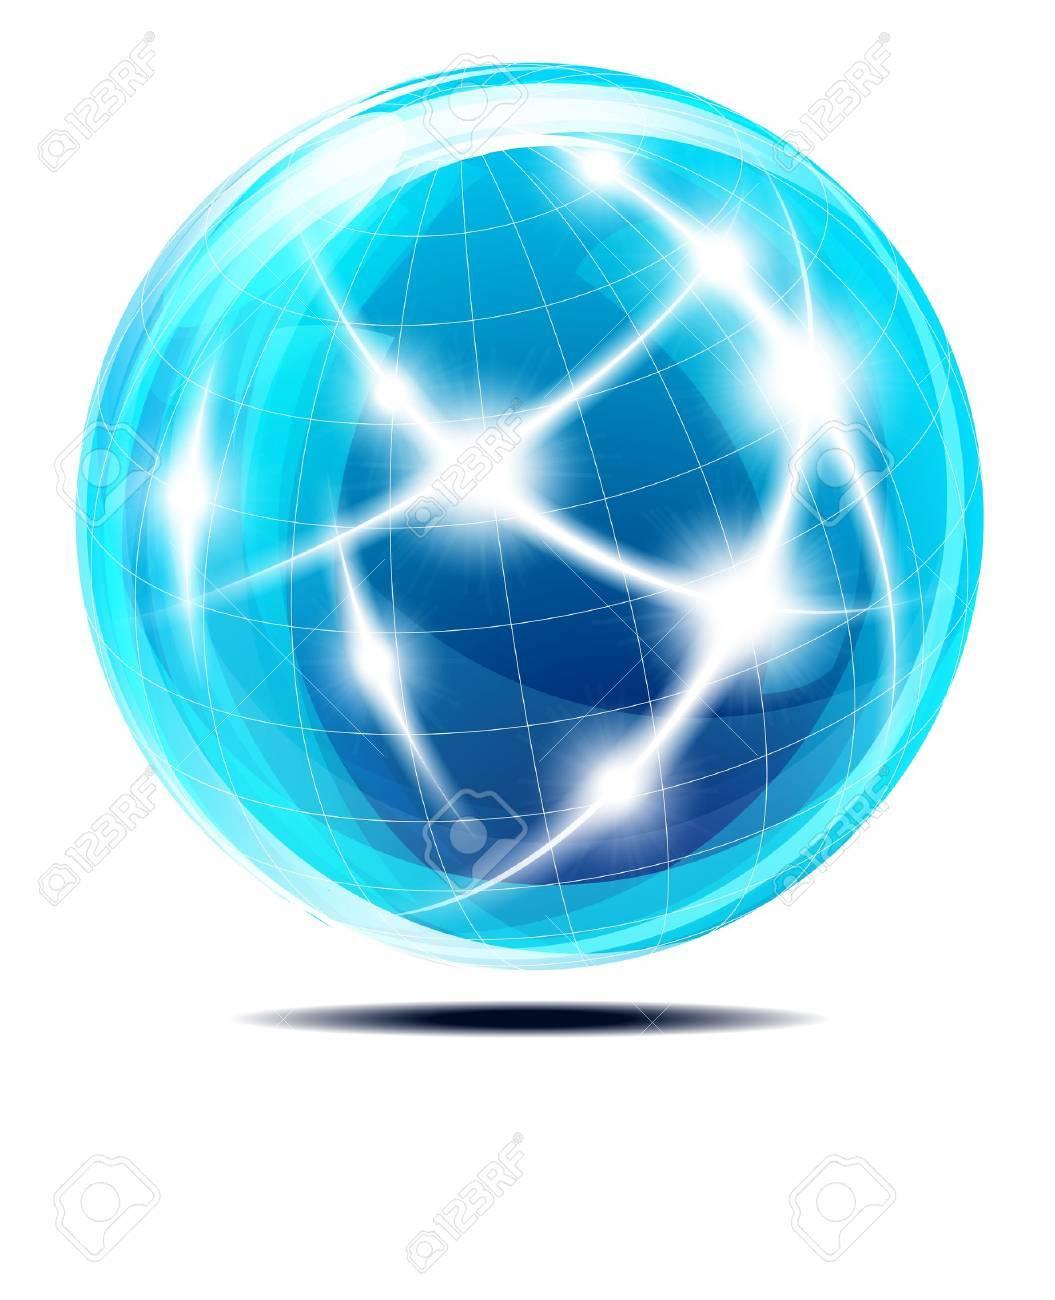 Abstract Communication Globe Stock Photo - 11243696